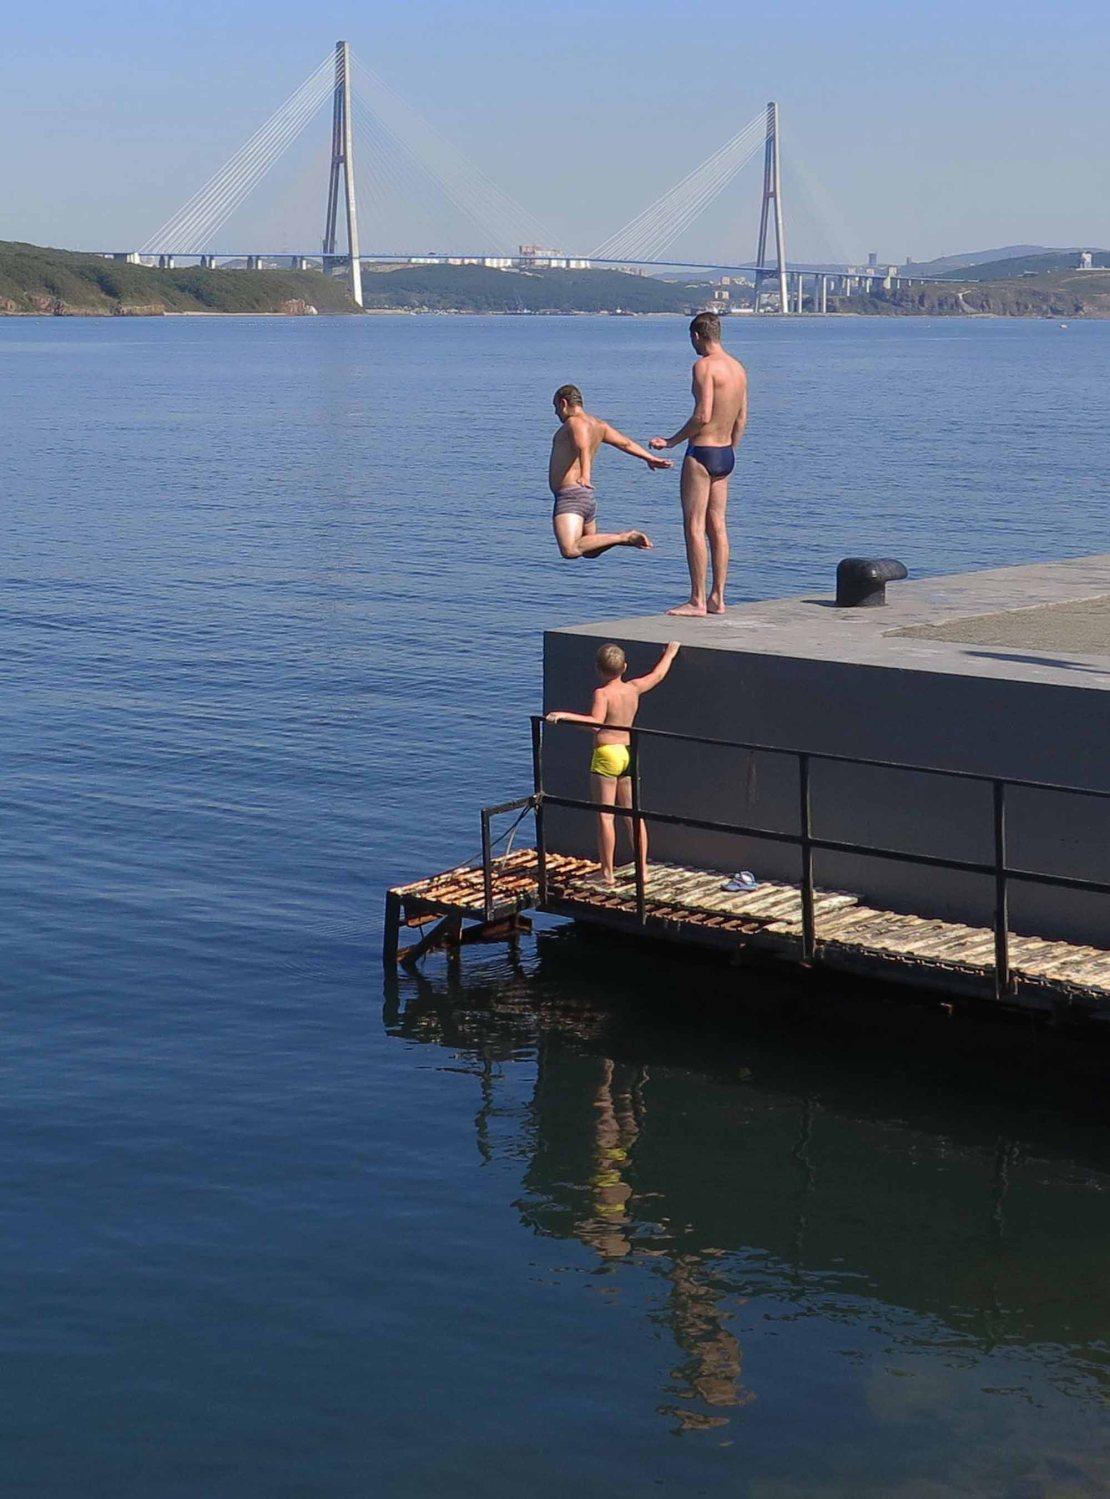 Russia-Trans-Siberian-Railway-Vladivostok-Swimming